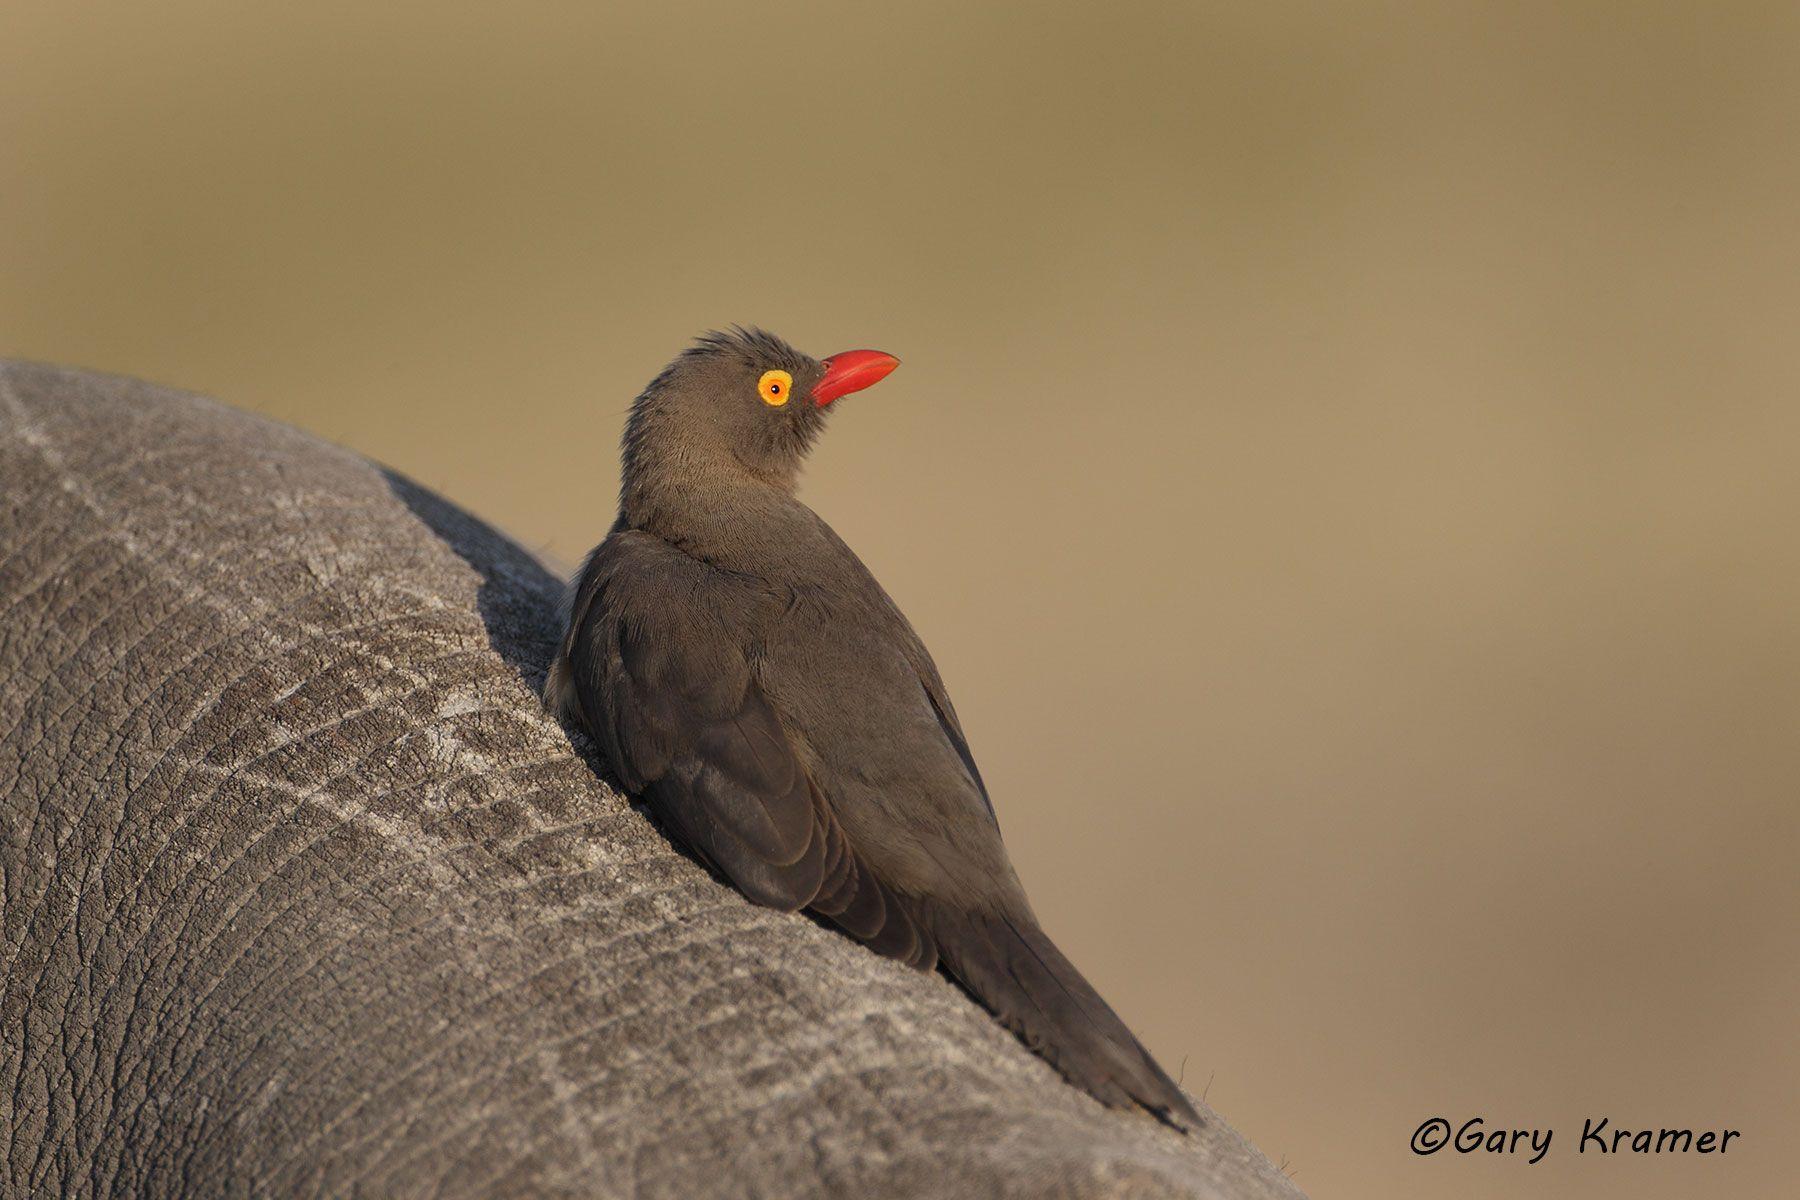 Red-billed Oxpecker (Buphagus erythrorhynchus) - ABXr#050d